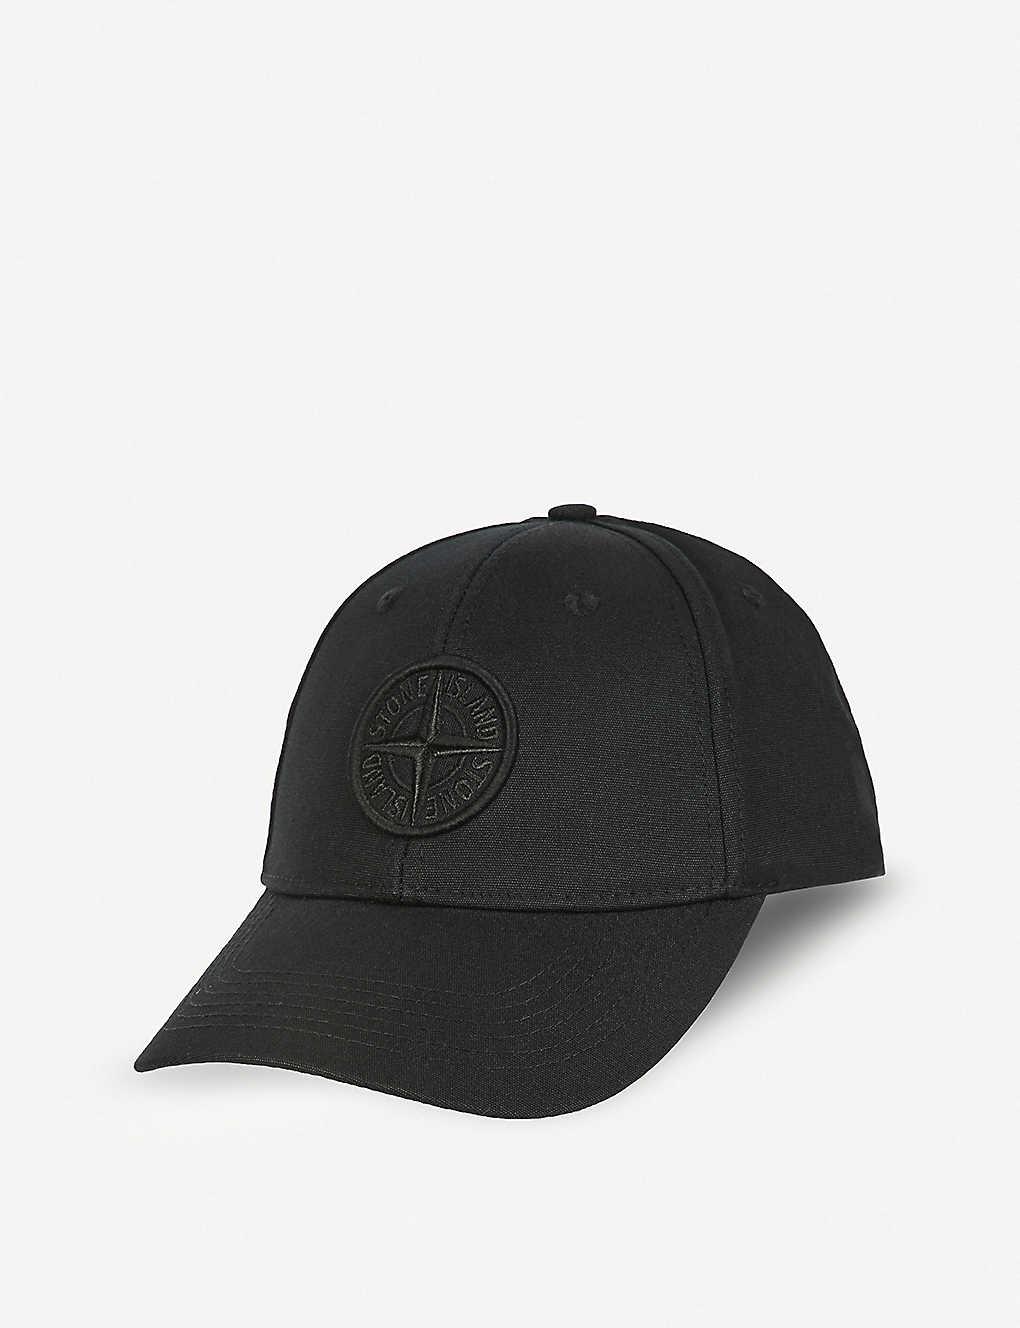 STONE ISLAND - Logo-detail baseball cap  2dafcf85a605